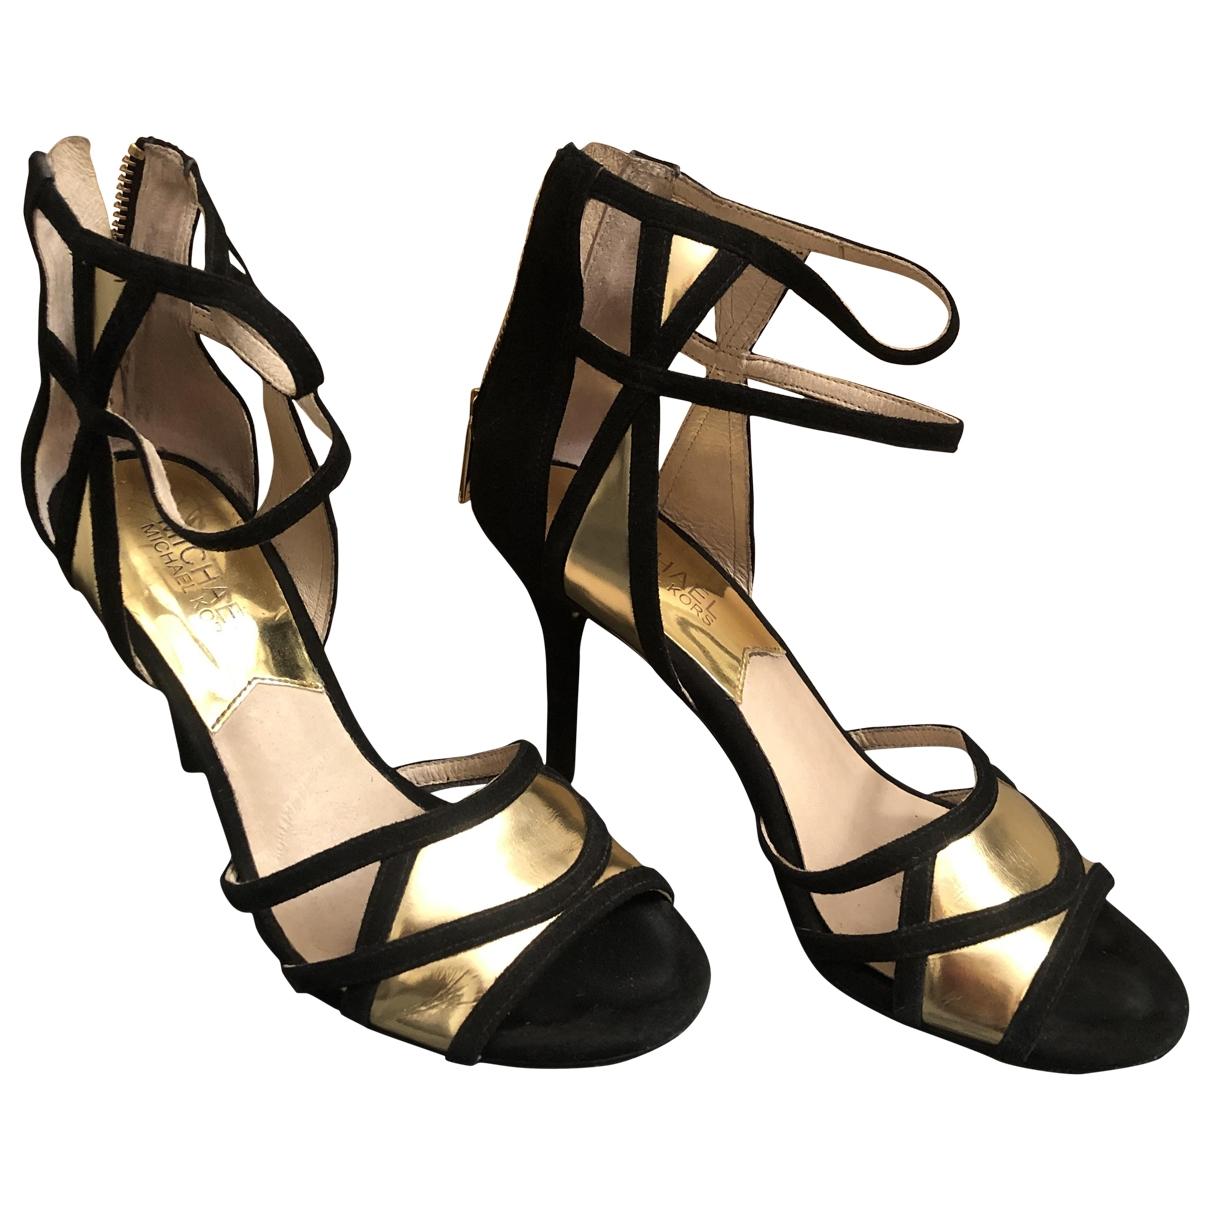 Michael Kors \N Black Suede Sandals for Women 36 EU